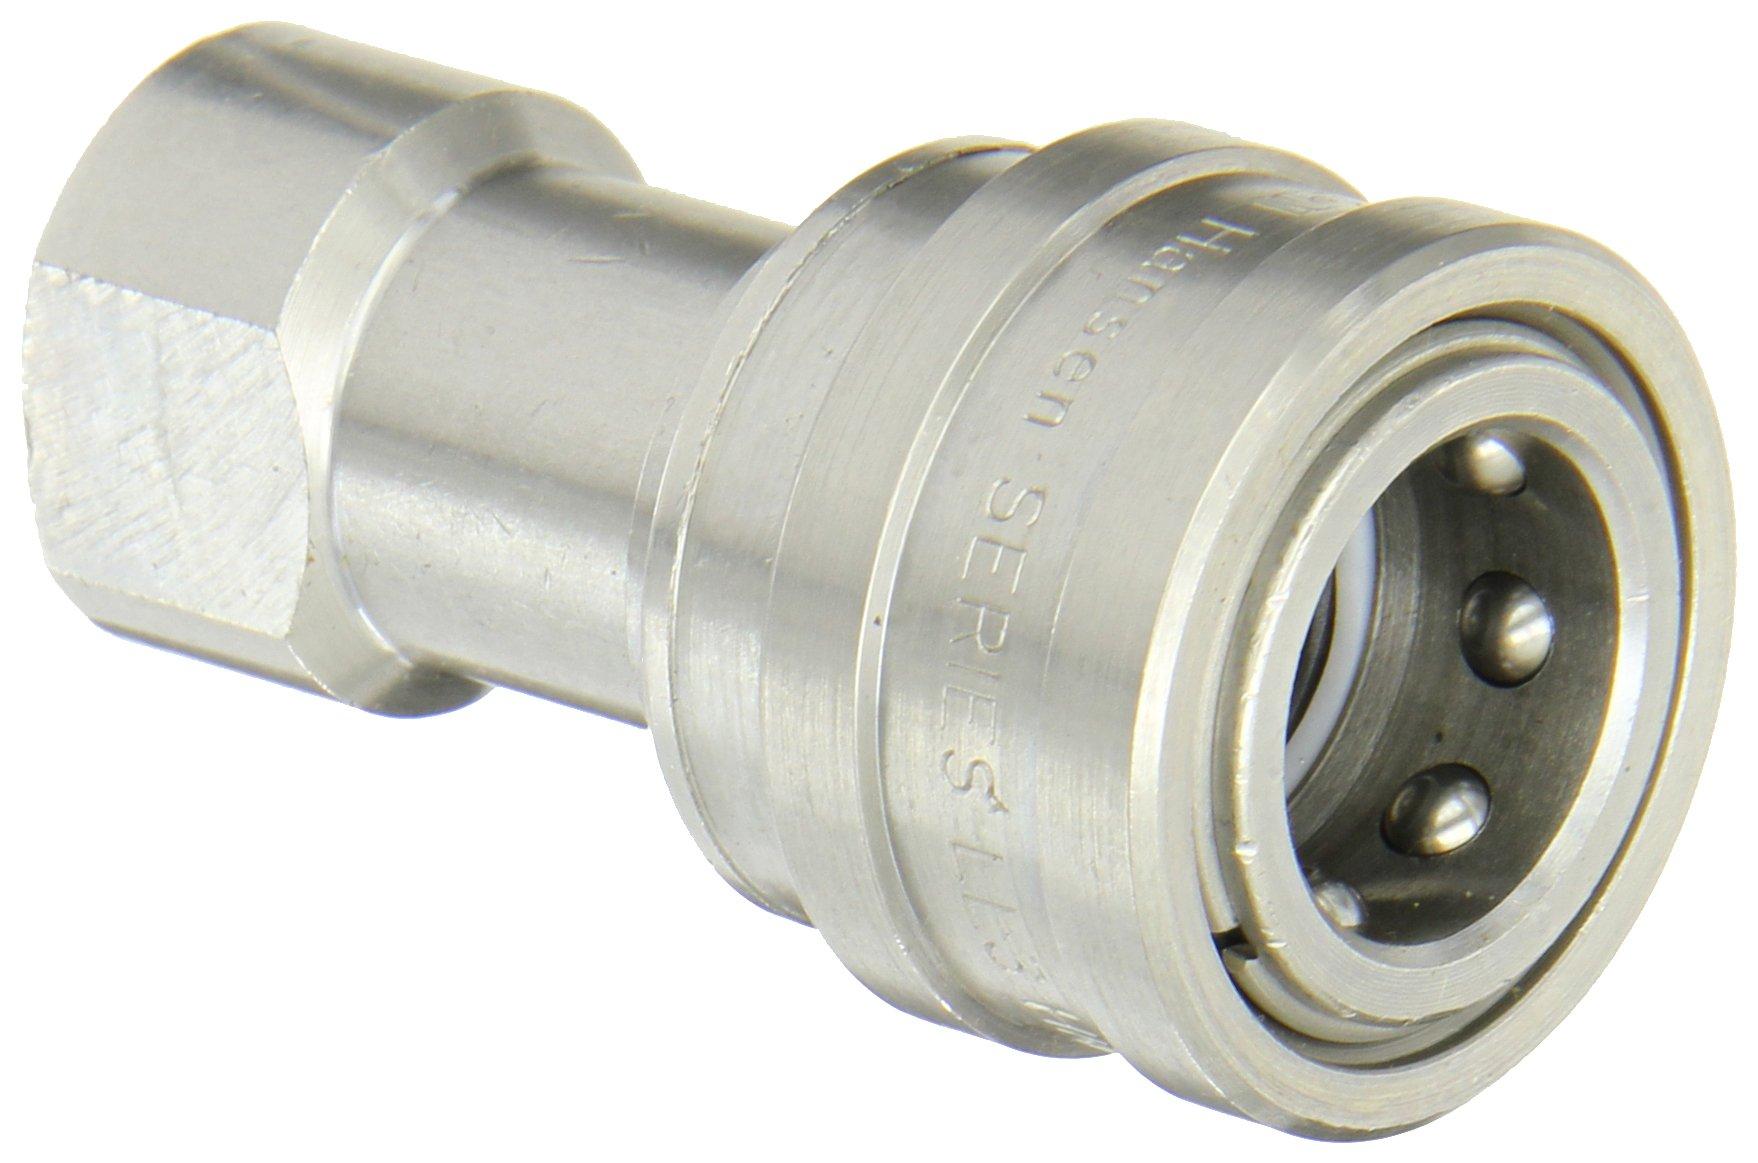 Eaton Hansen LL3H21 Stainless Steel 303 ISO-B Interchange Hydraulic Fitting, Socket with Valve, 3/8''-18 NPTF Female, 3/8'' Body